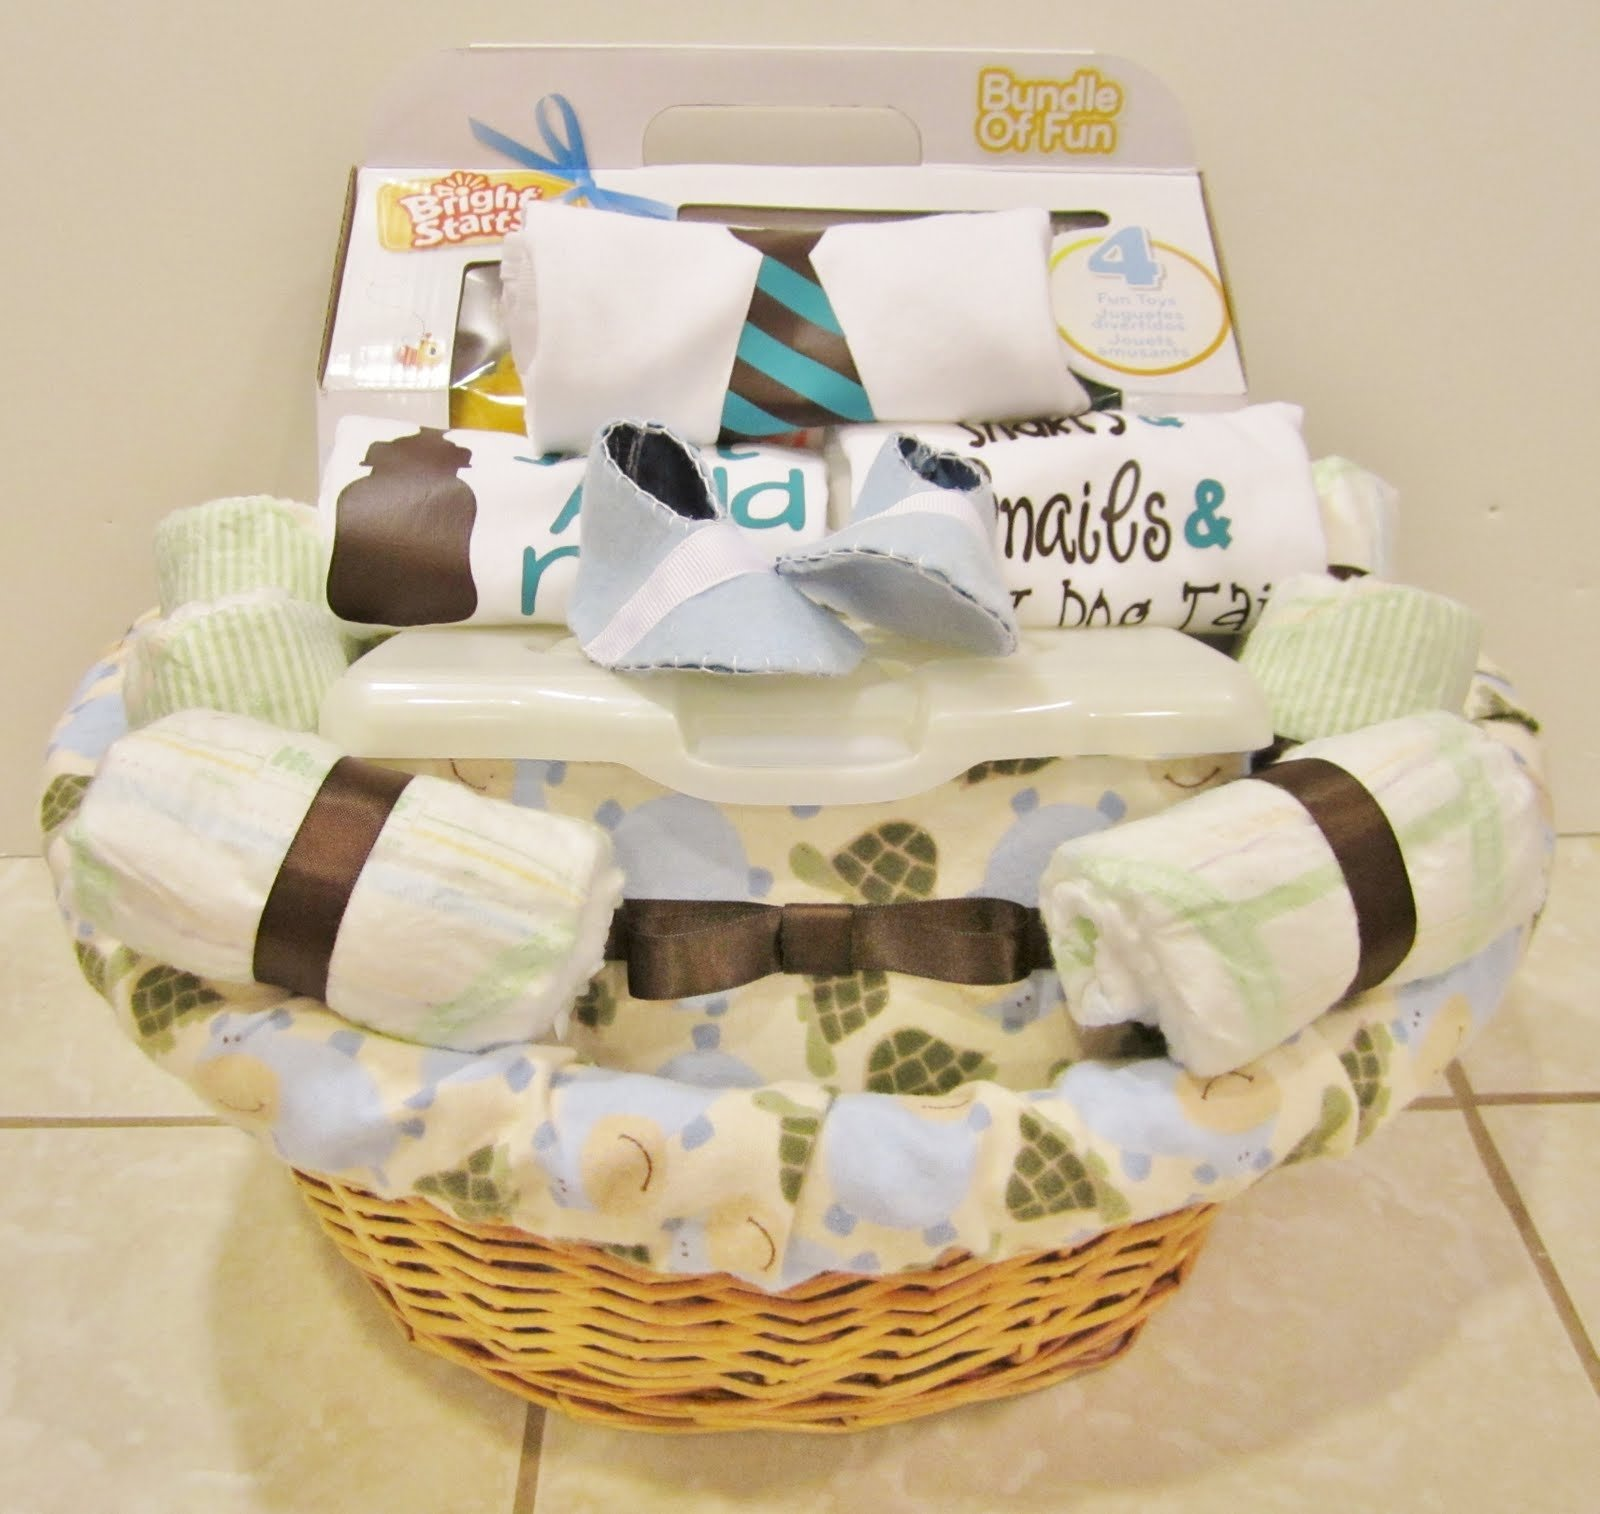 10 Most Popular Baby Boy Gift Basket Ideas rare babyower gift boy ideas diy uk sets basket best photos also 2020